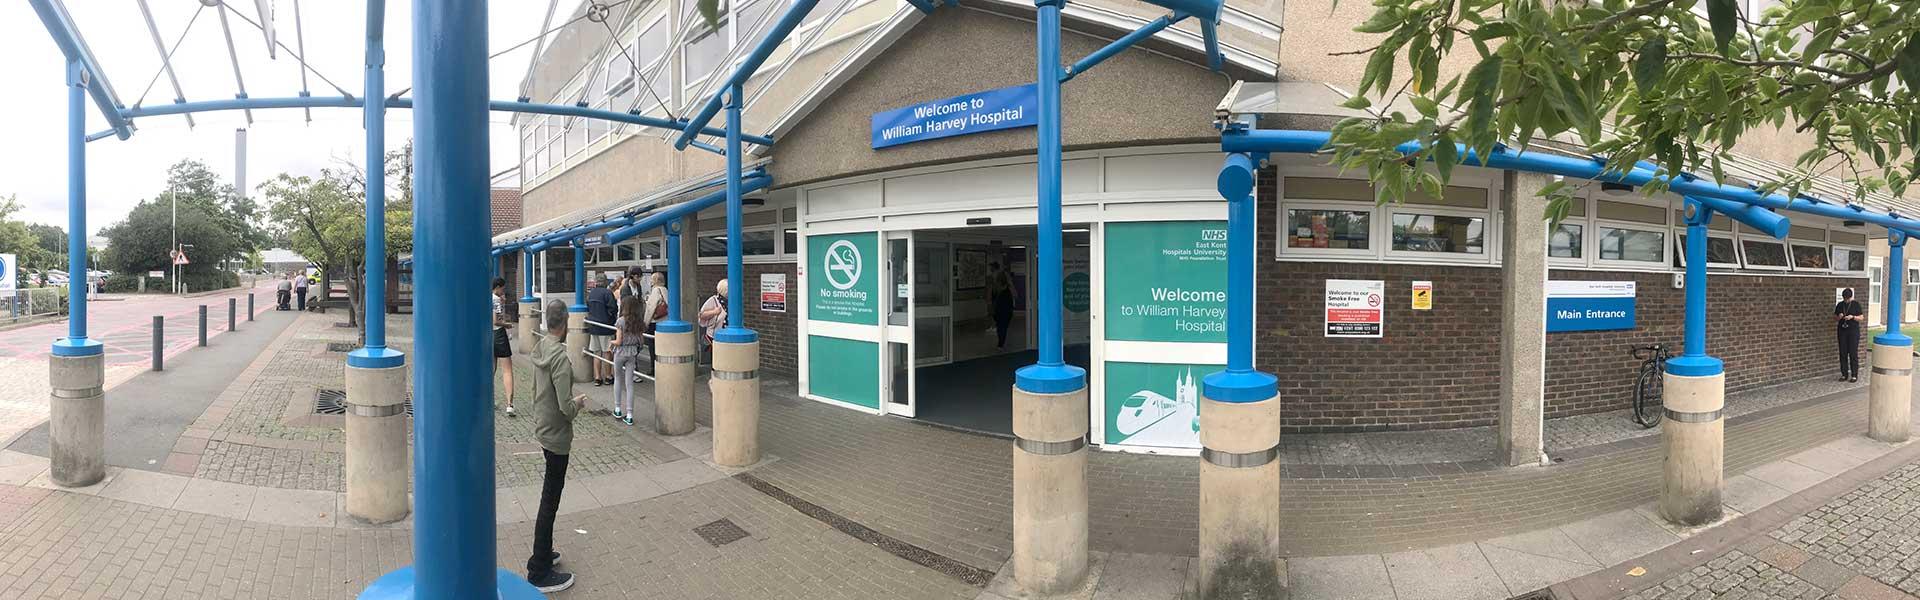 William Harvey Hospital in Ashford, Kent